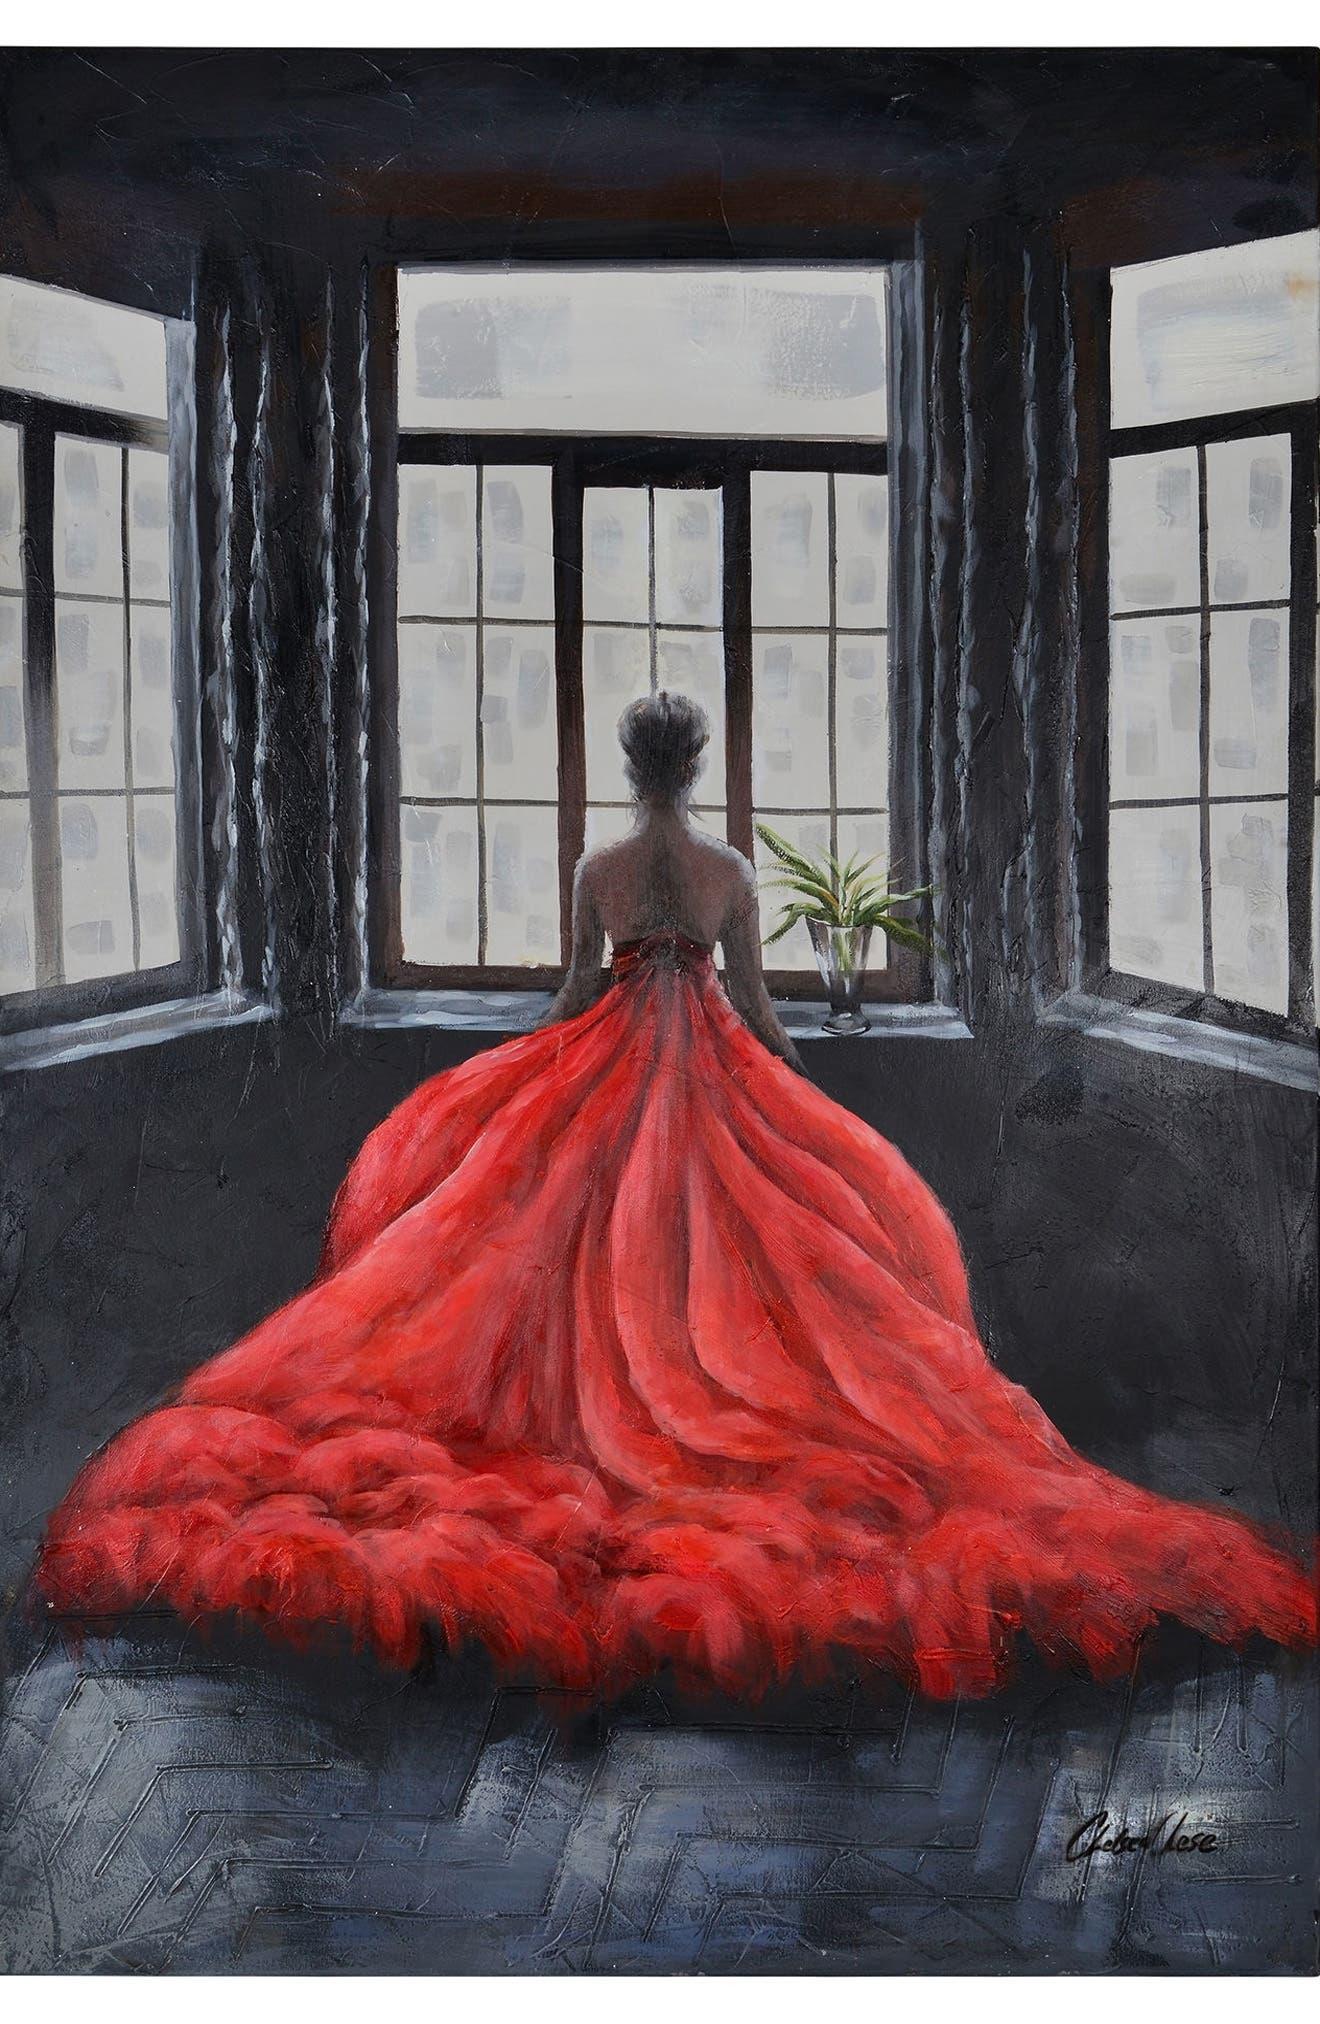 Alternate Image 1 Selected - Renwil Marbella Canvas Art